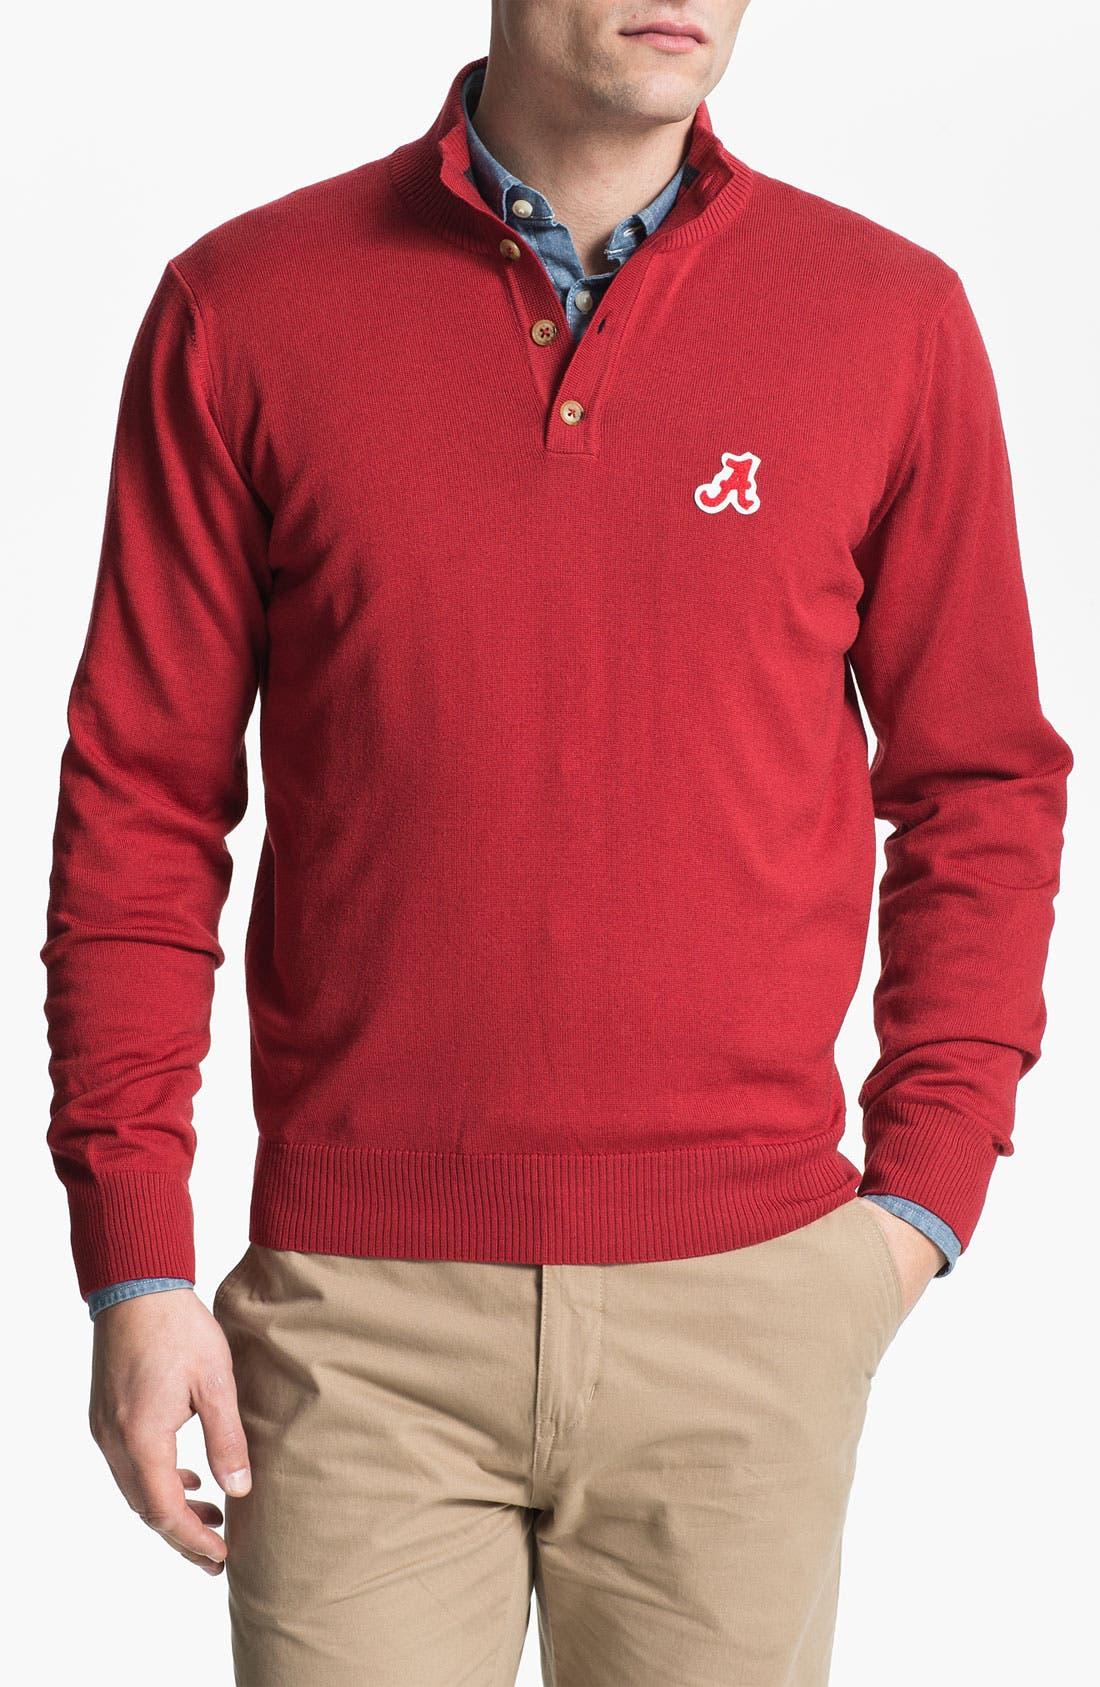 Alternate Image 1 Selected - Thomas Dean 'Alabama' Wool Sweater